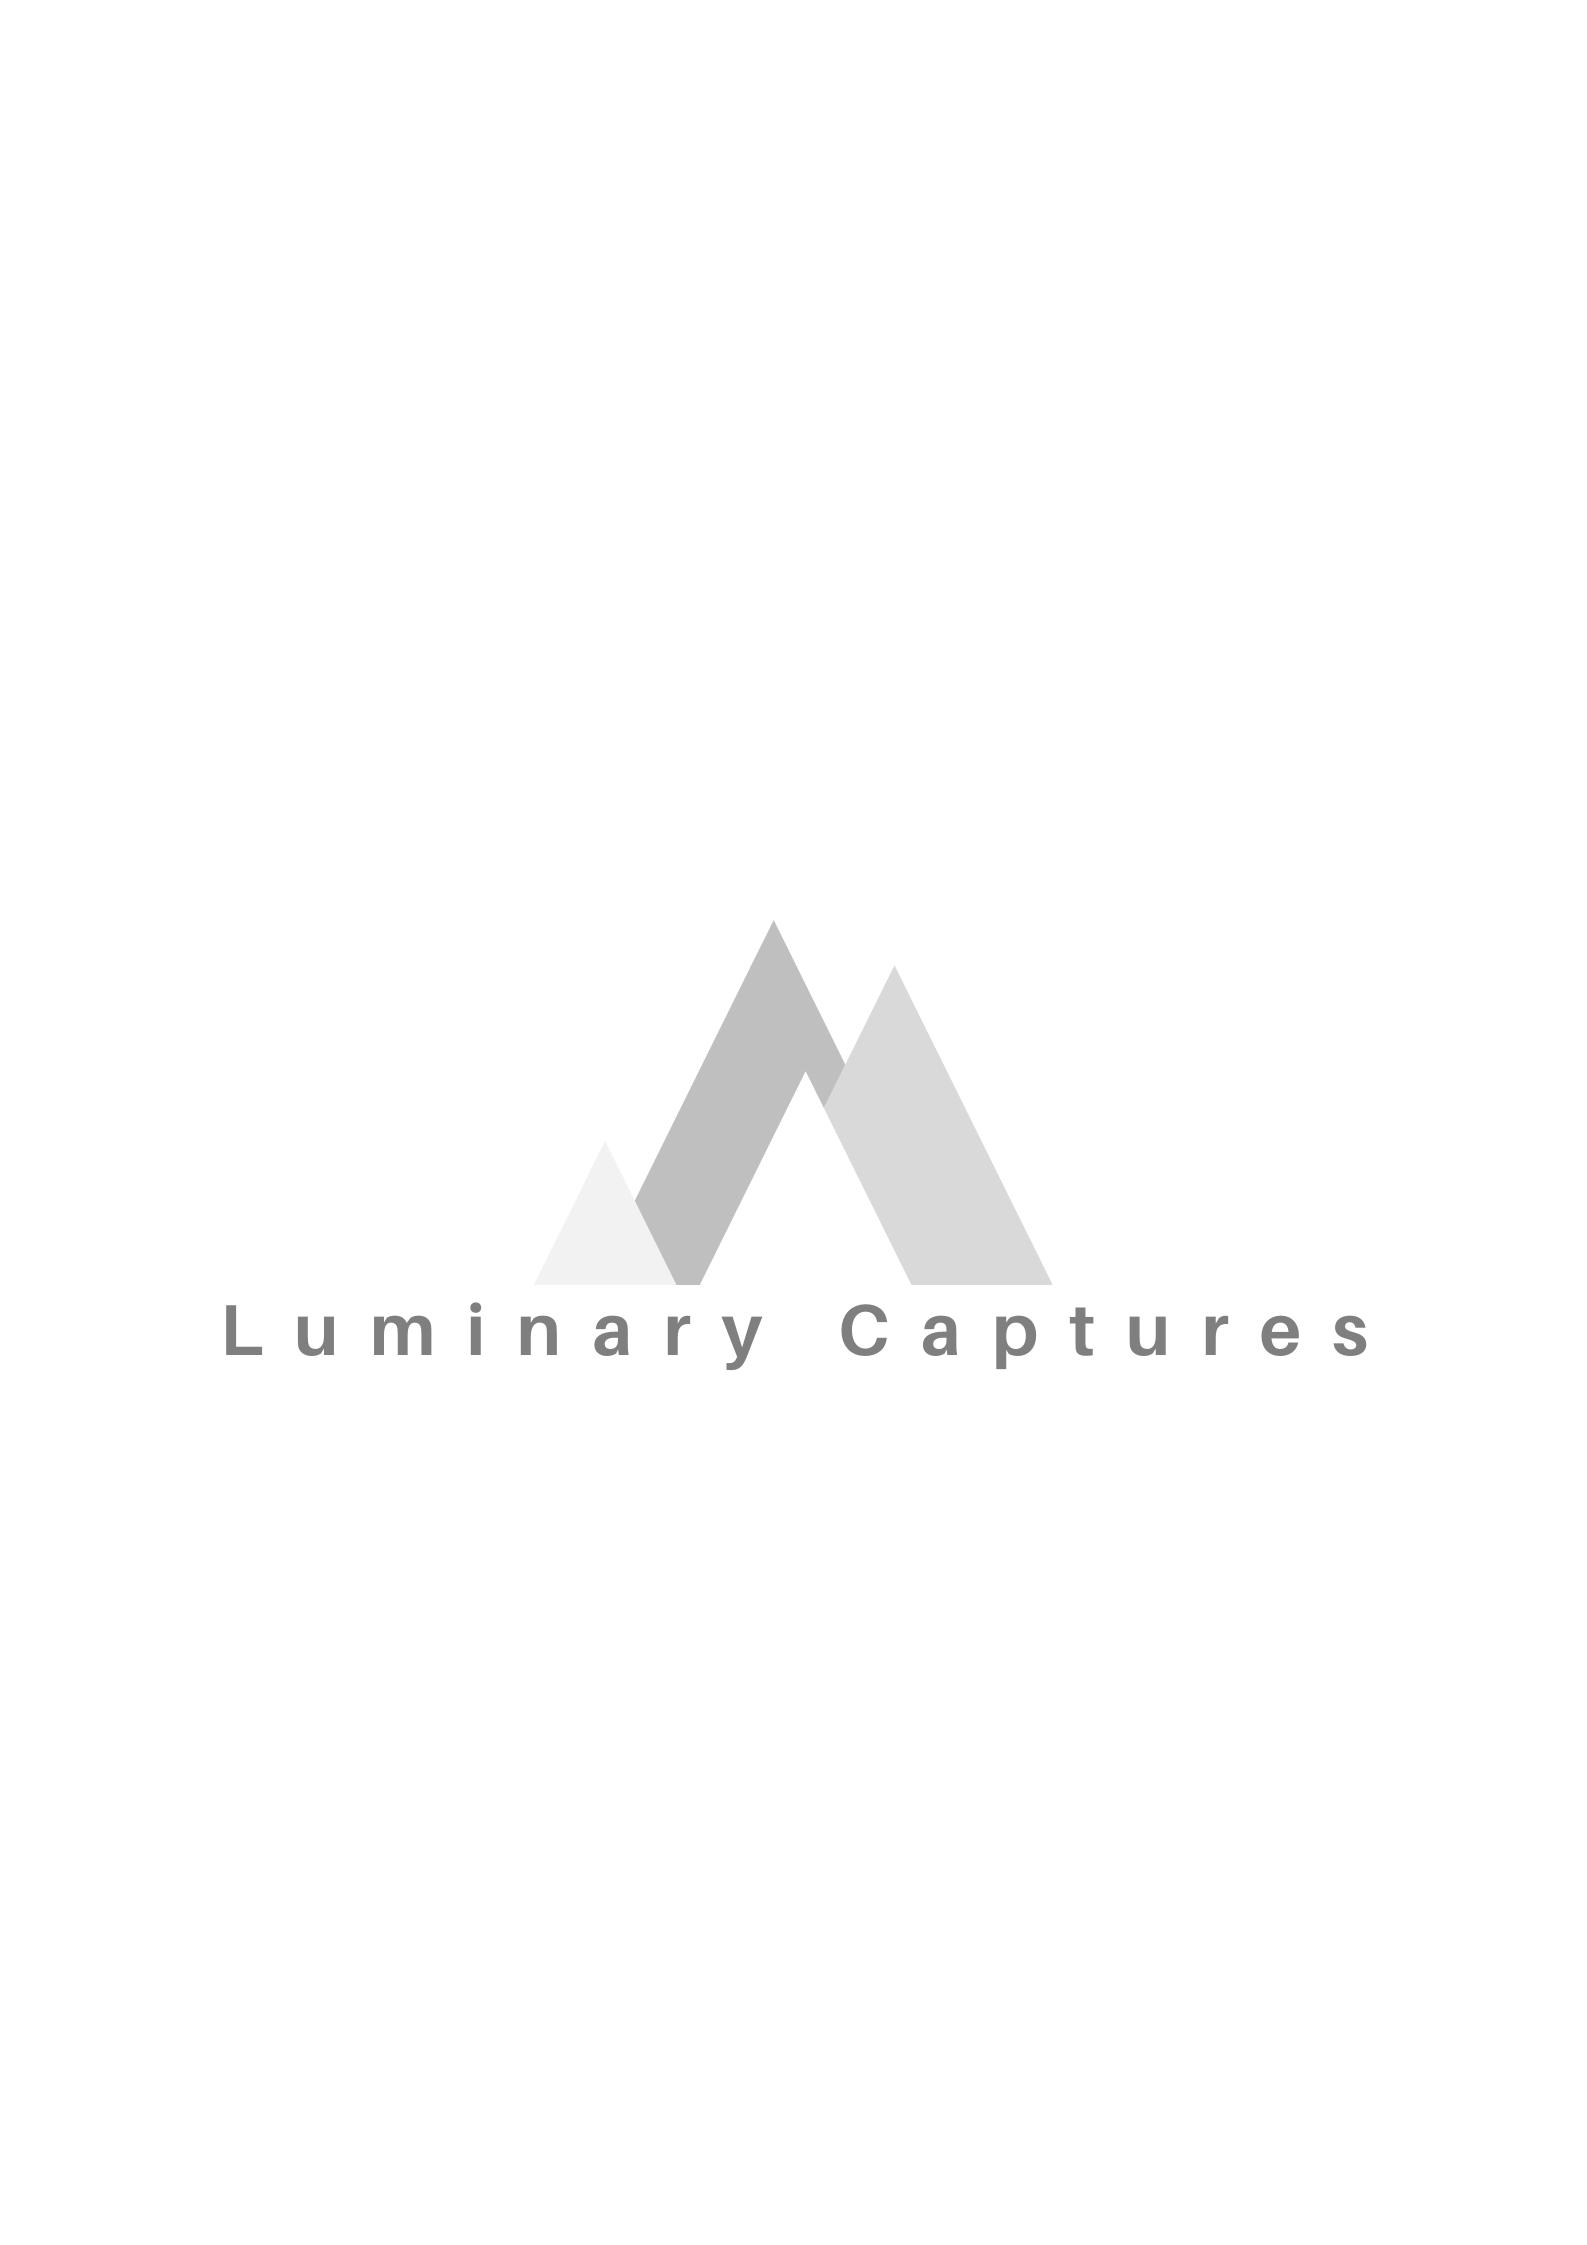 Luminary Captures | Wade Wilson